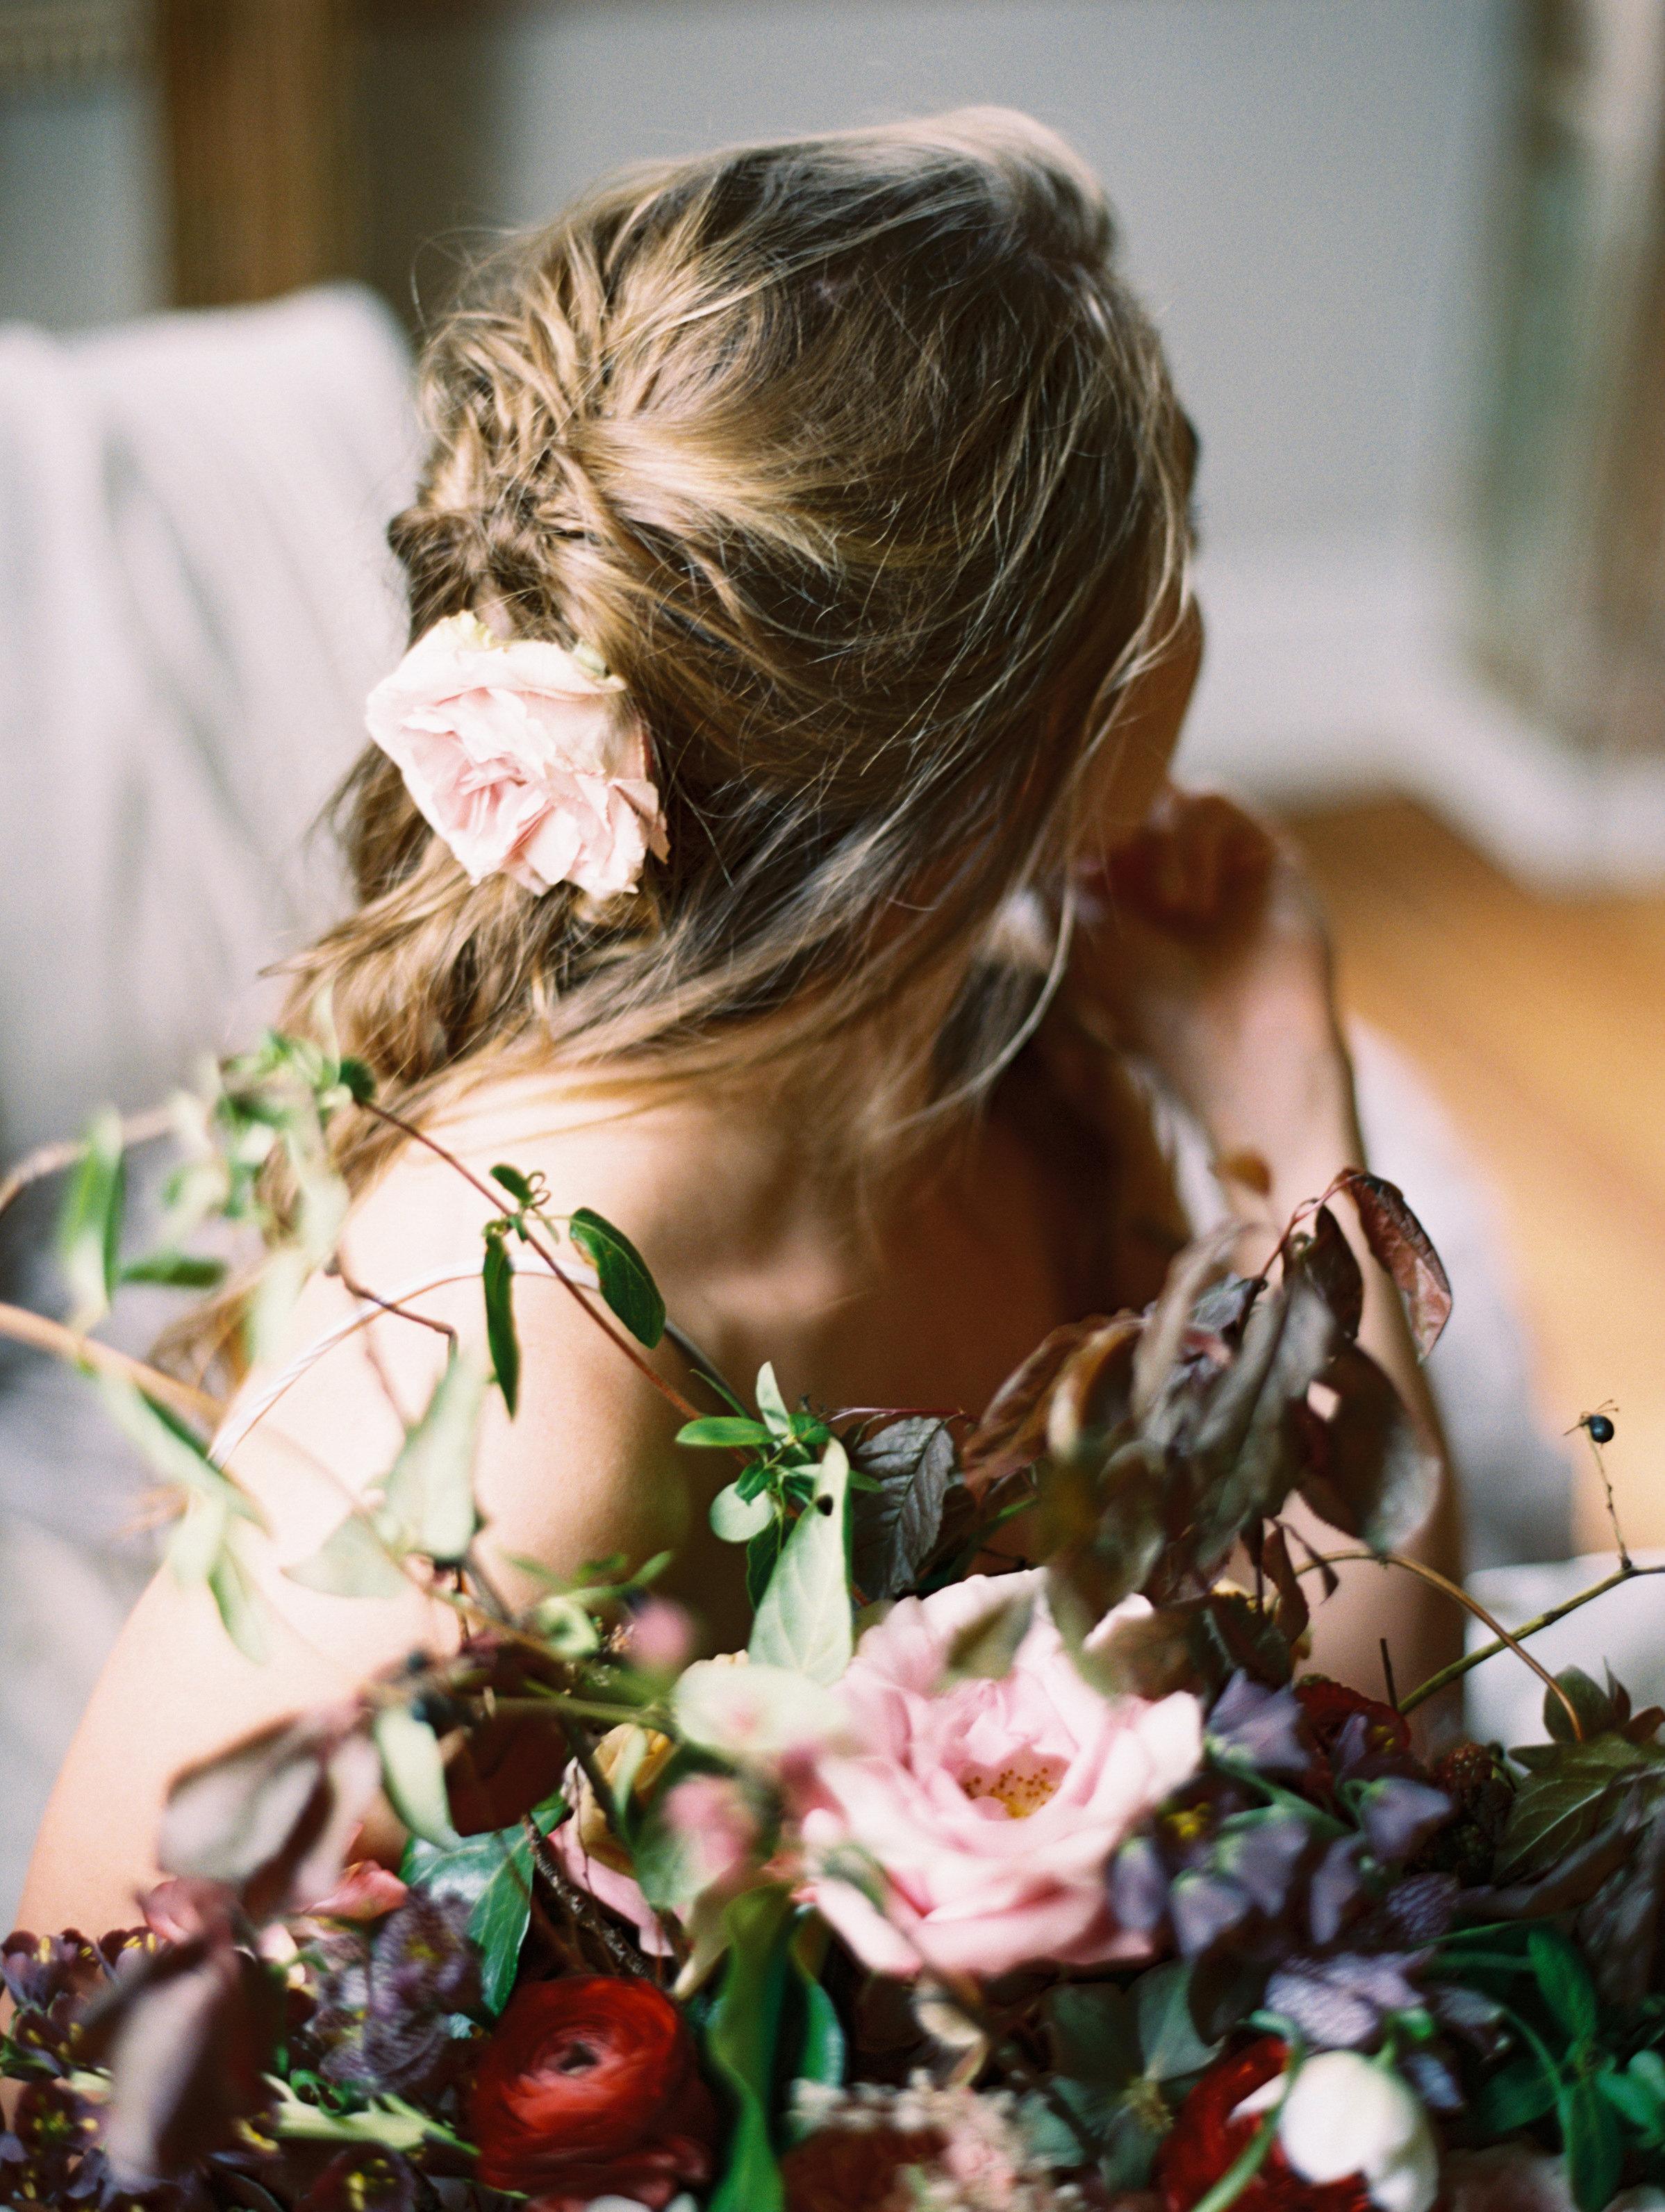 Euphorbia lavender wedding gown-0006.jpg